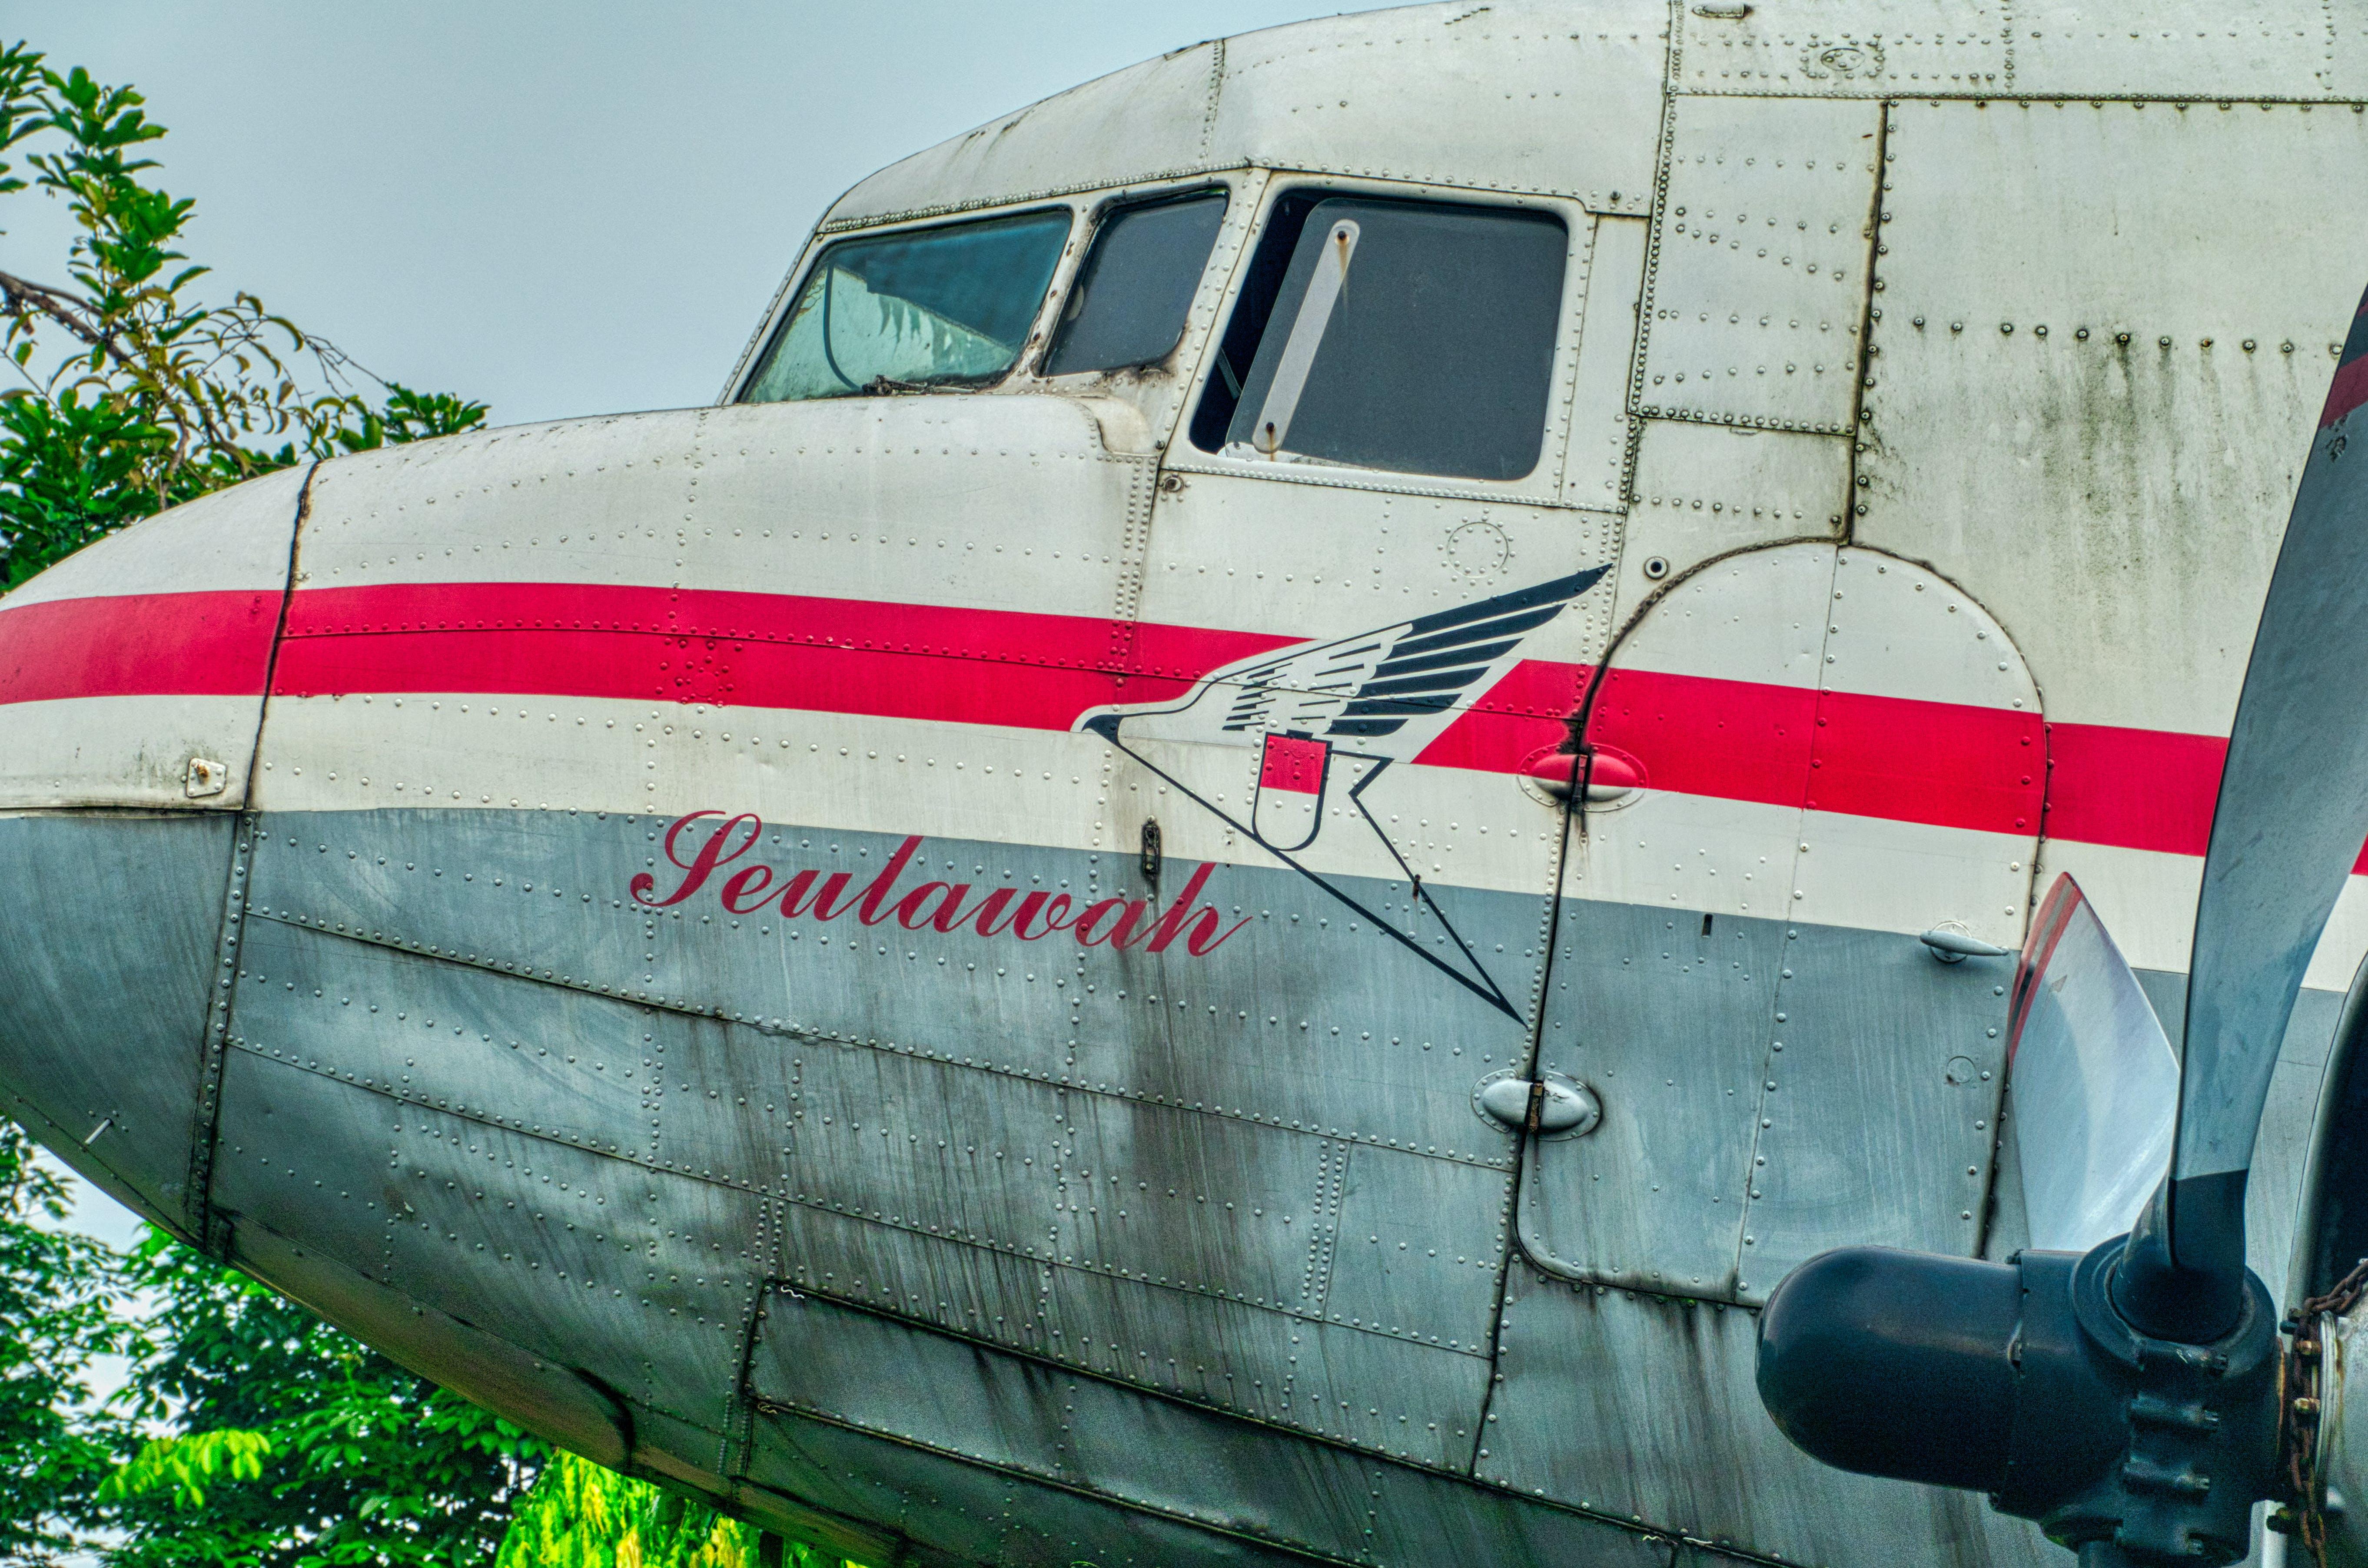 Kostenloses Stock Foto zu fahrzeug, flugzeug, indonesien, transportsystem